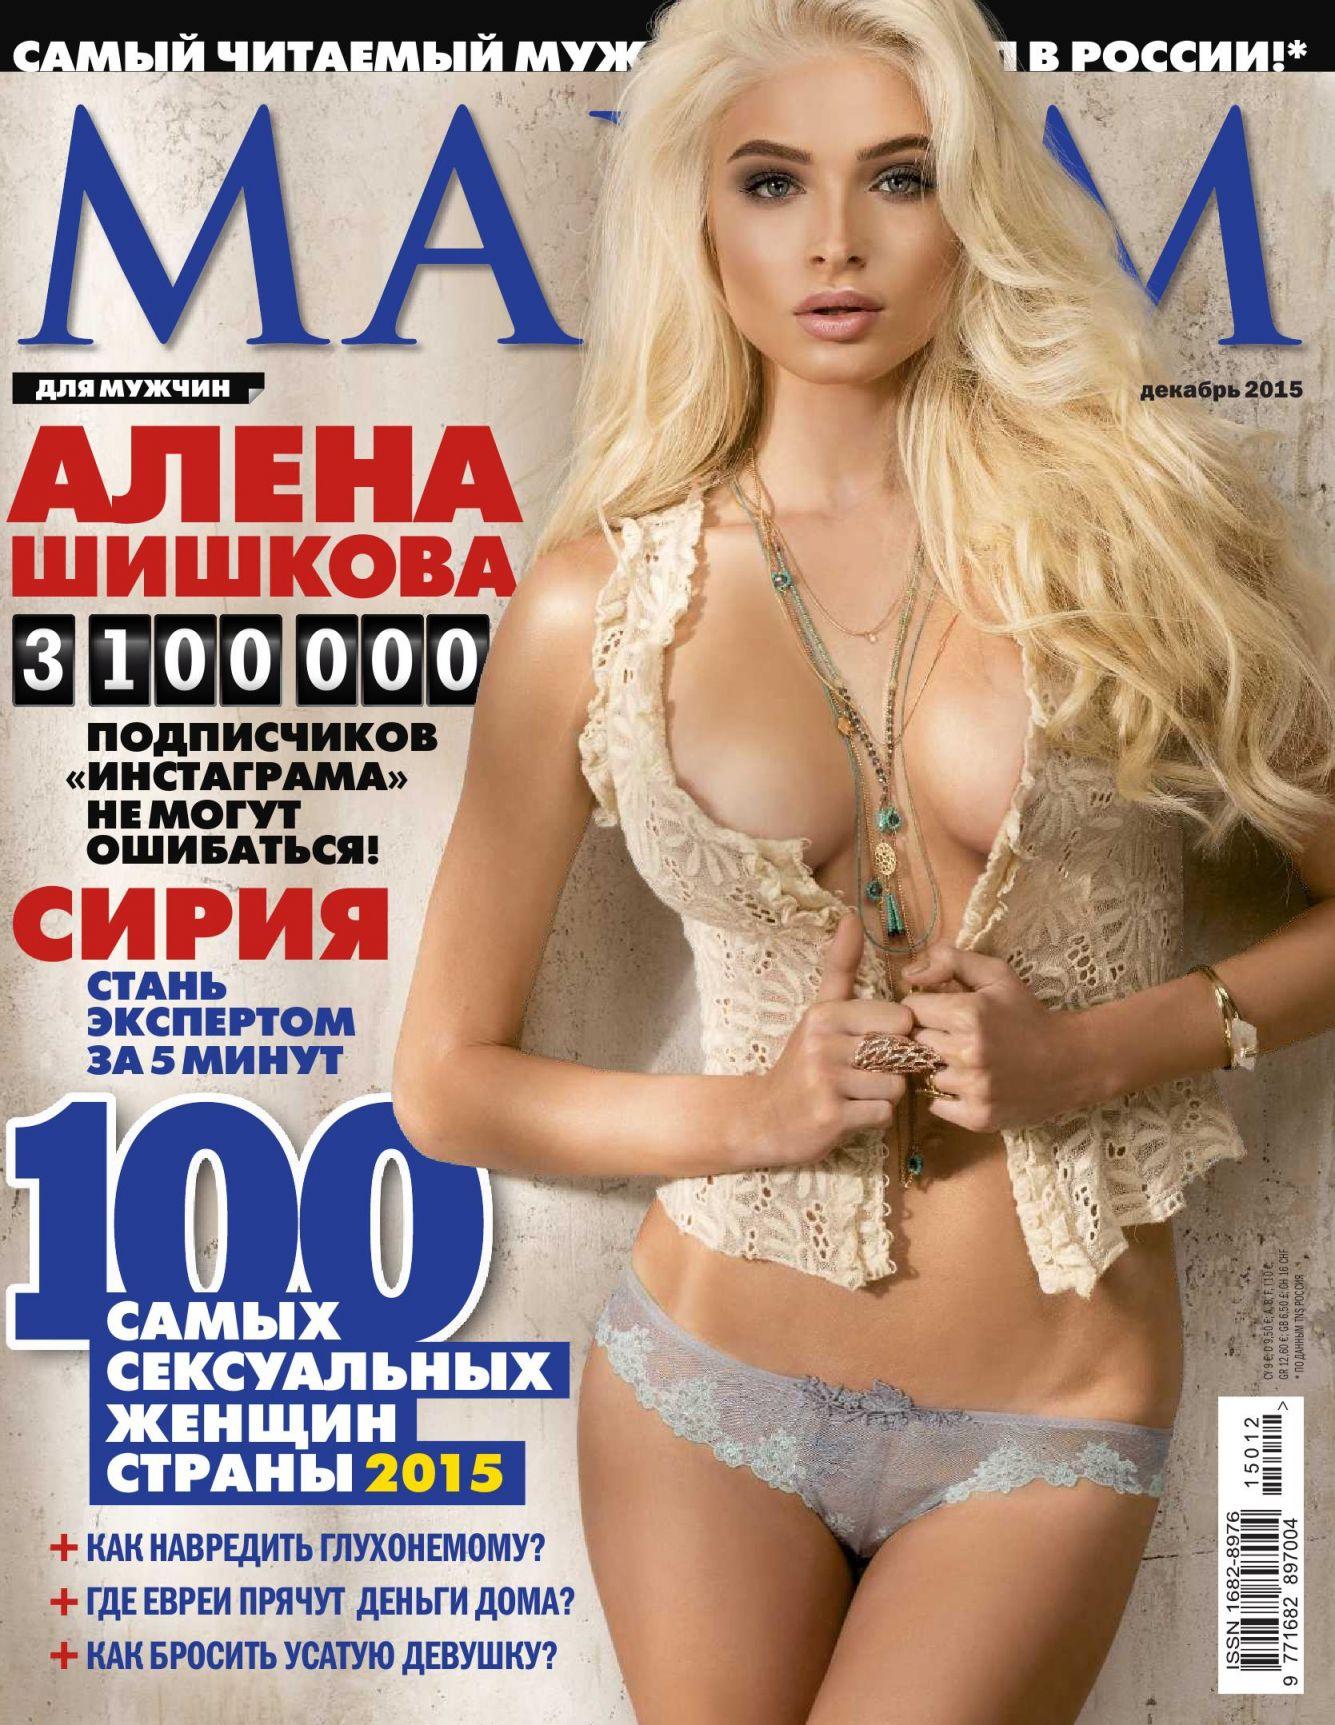 Alena Shishkova topless  (1)